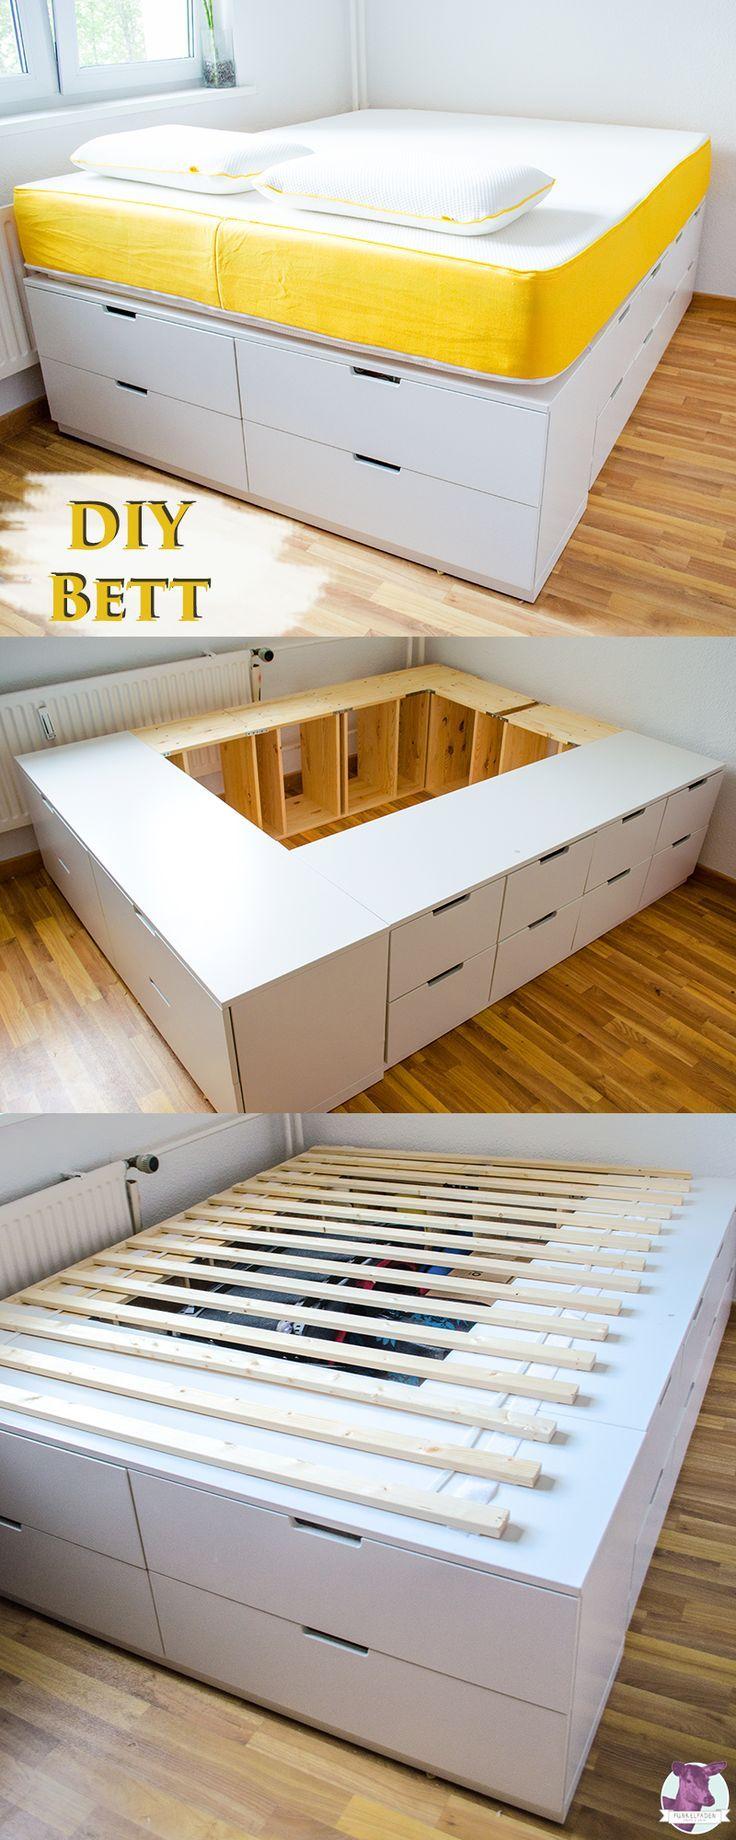 Photo of DIY IKEA HACk – Plattform-Bett selber bauen fra Ikea Kommoden / werbung